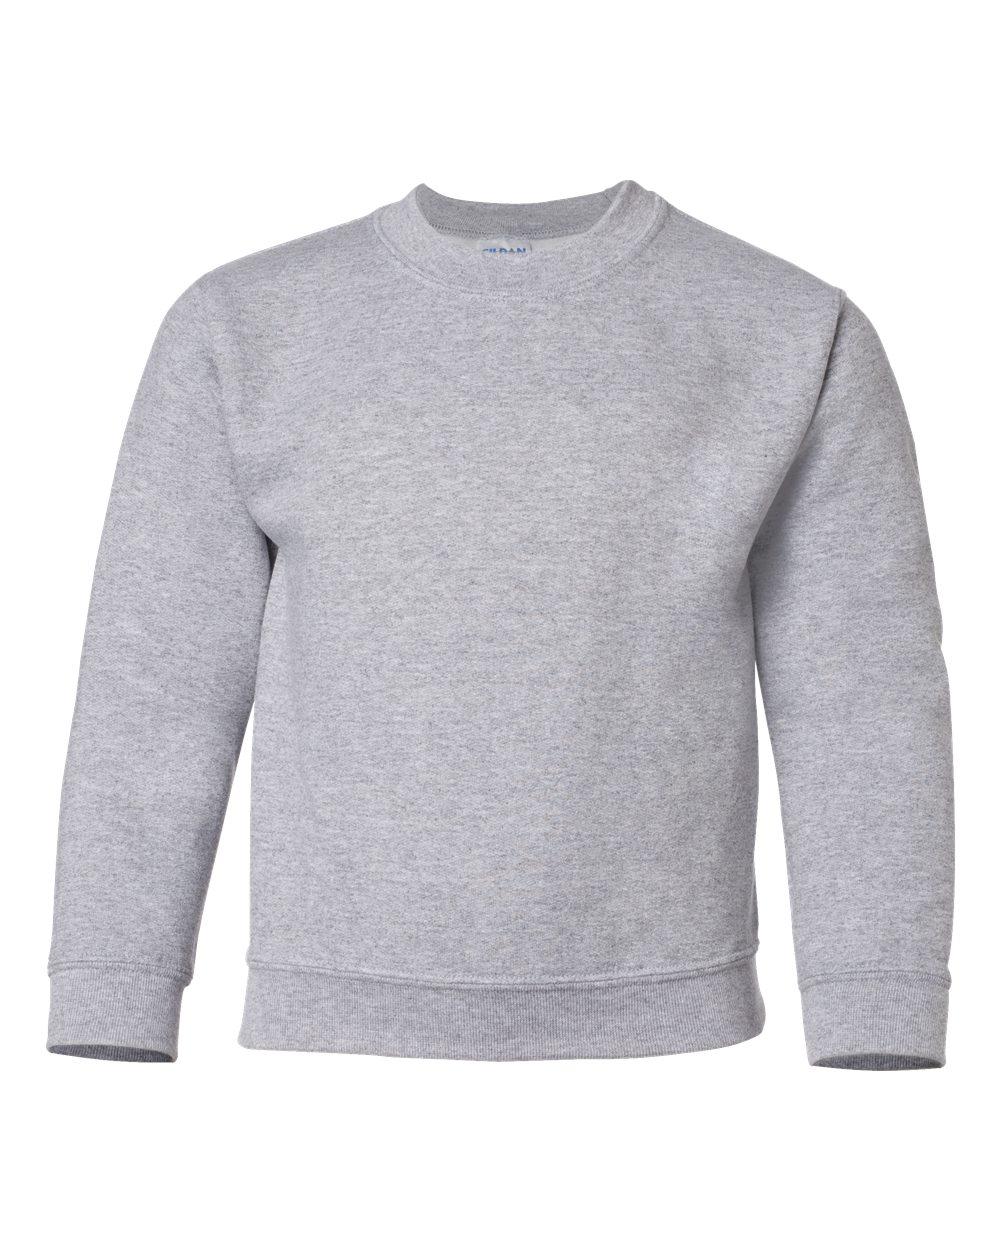 Youth Fit Crewneck Sweatshirt